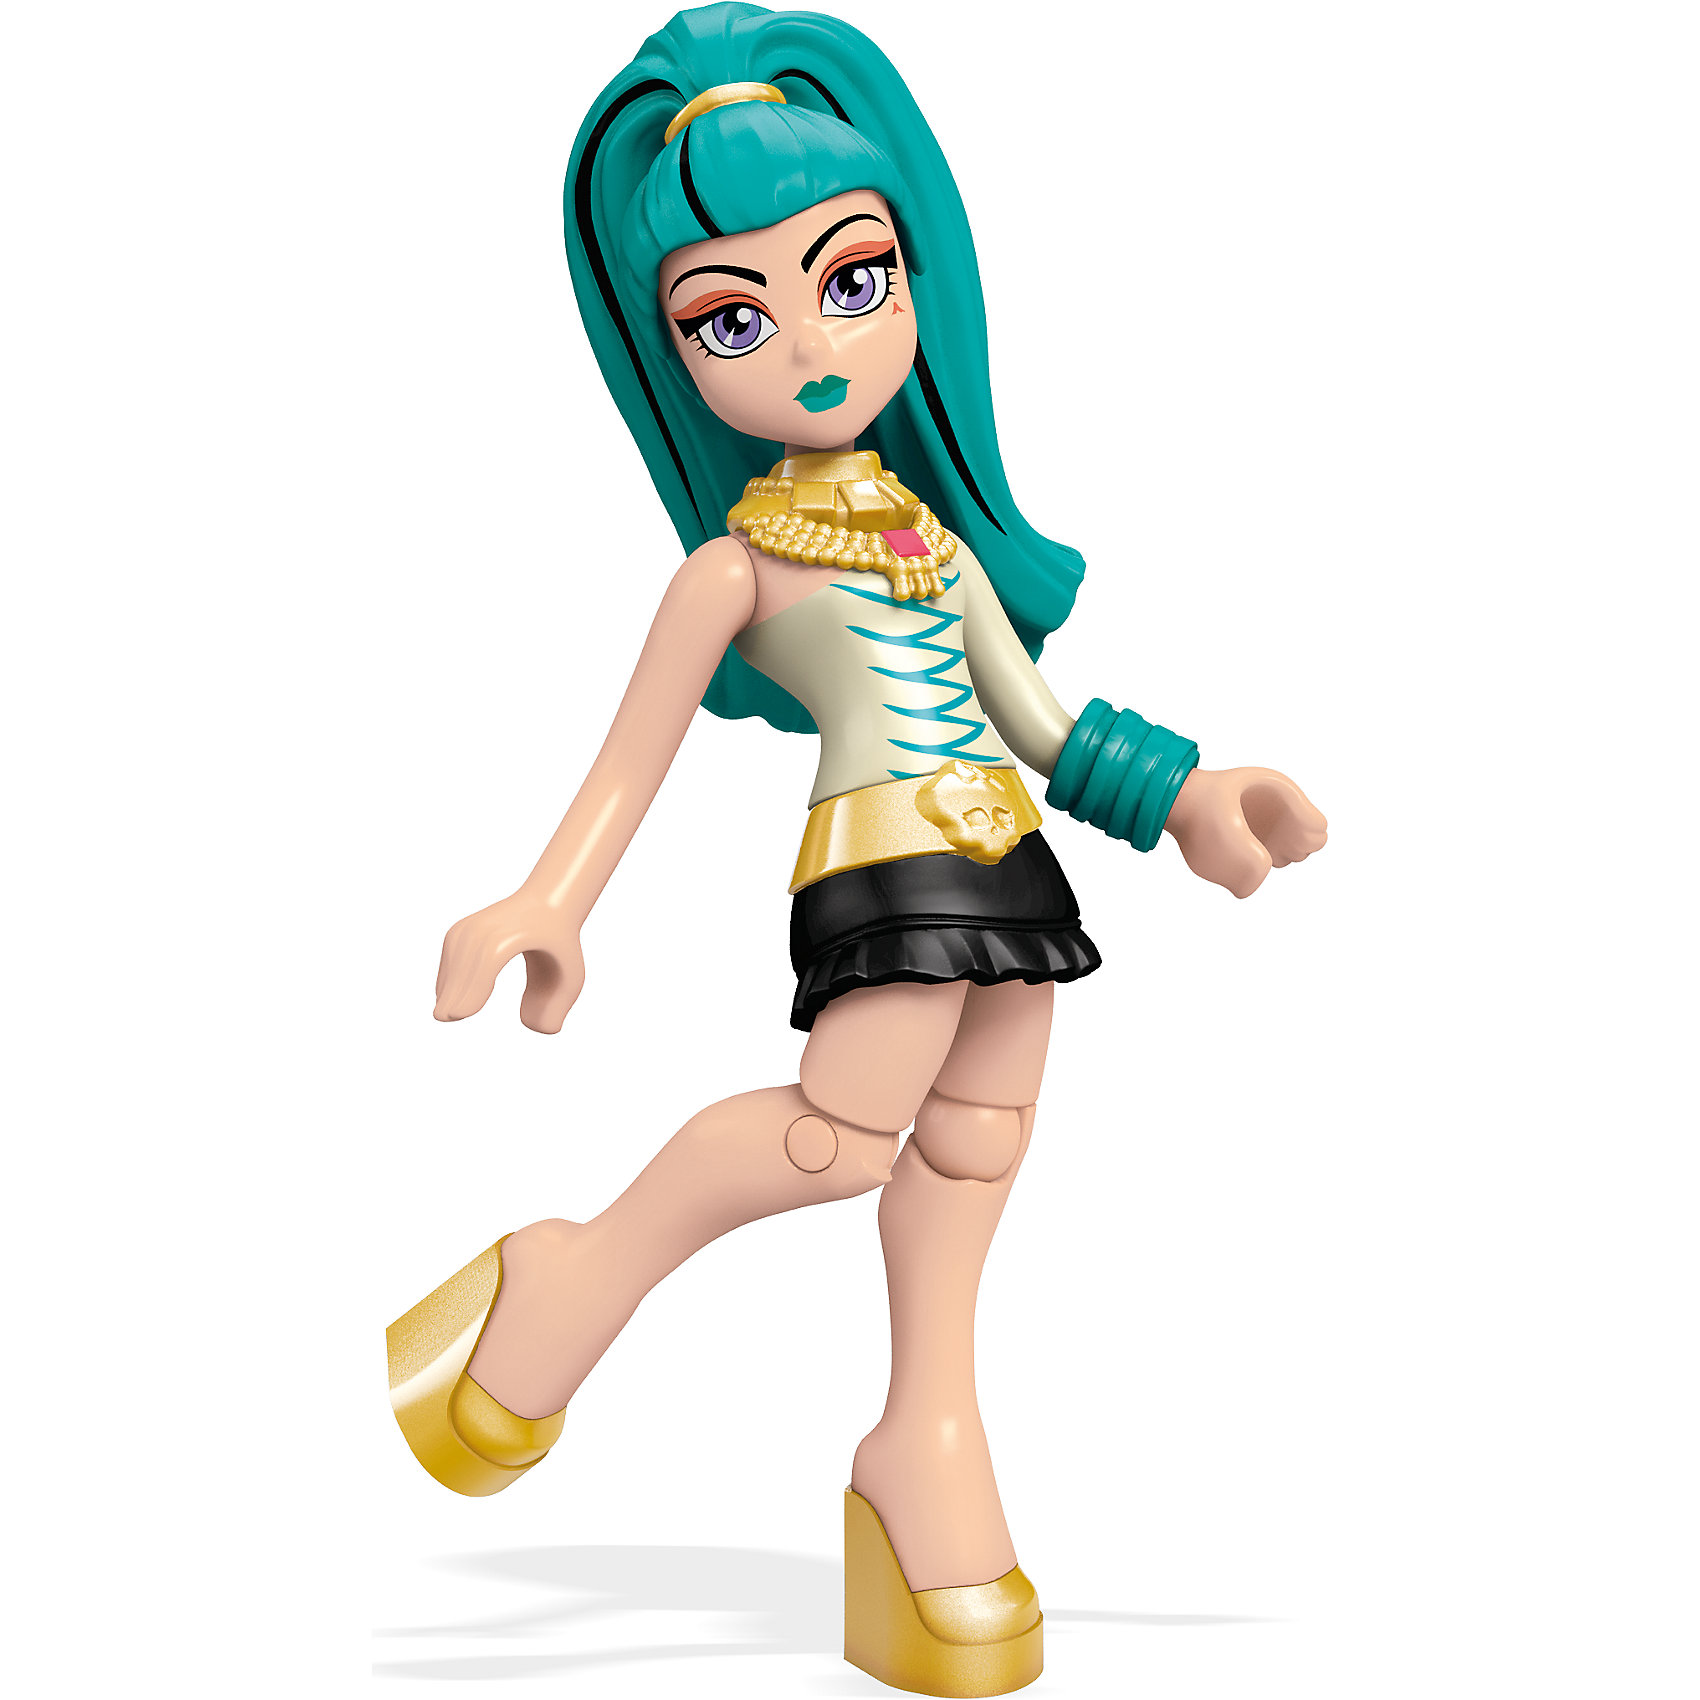 Мини-кукла Mega Bloks Monster High Нефера де Нил, 12,5 смМини-куклы<br><br><br>Ширина мм: 125<br>Глубина мм: 85<br>Высота мм: 25<br>Вес г: 17<br>Возраст от месяцев: 72<br>Возраст до месяцев: 144<br>Пол: Женский<br>Возраст: Детский<br>SKU: 5559845